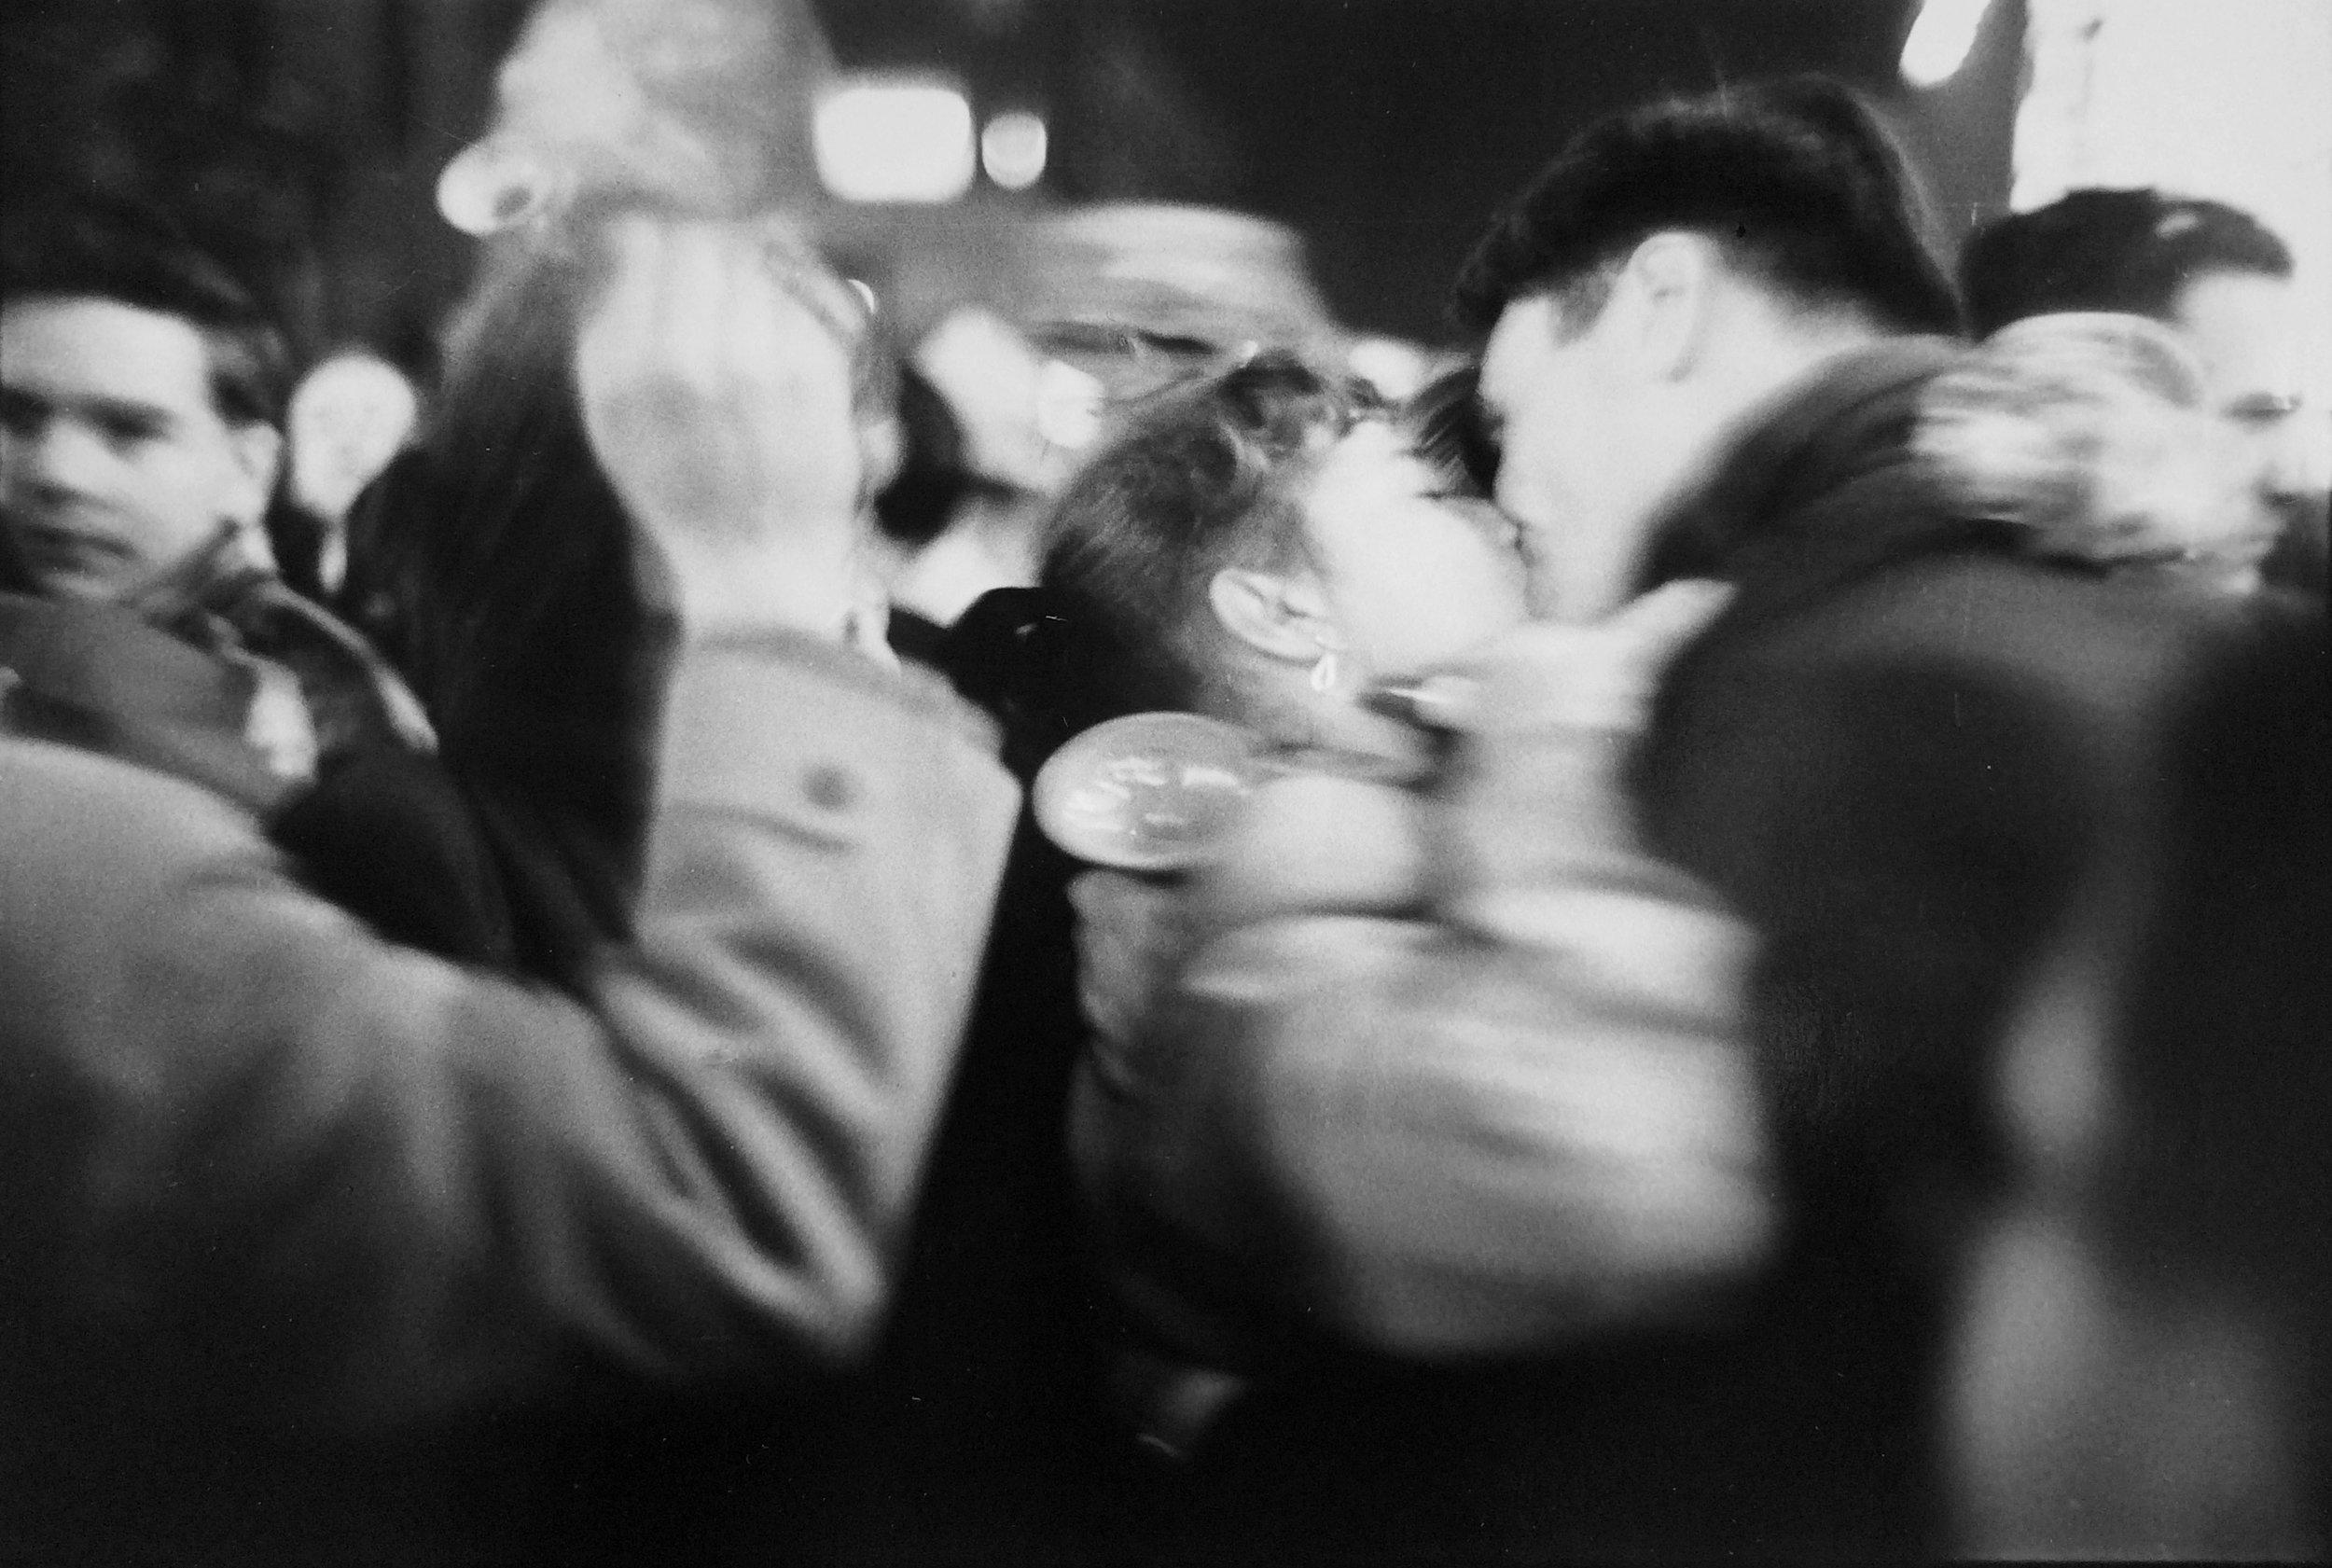 Saul Leiter_Kiss_1952.JPG